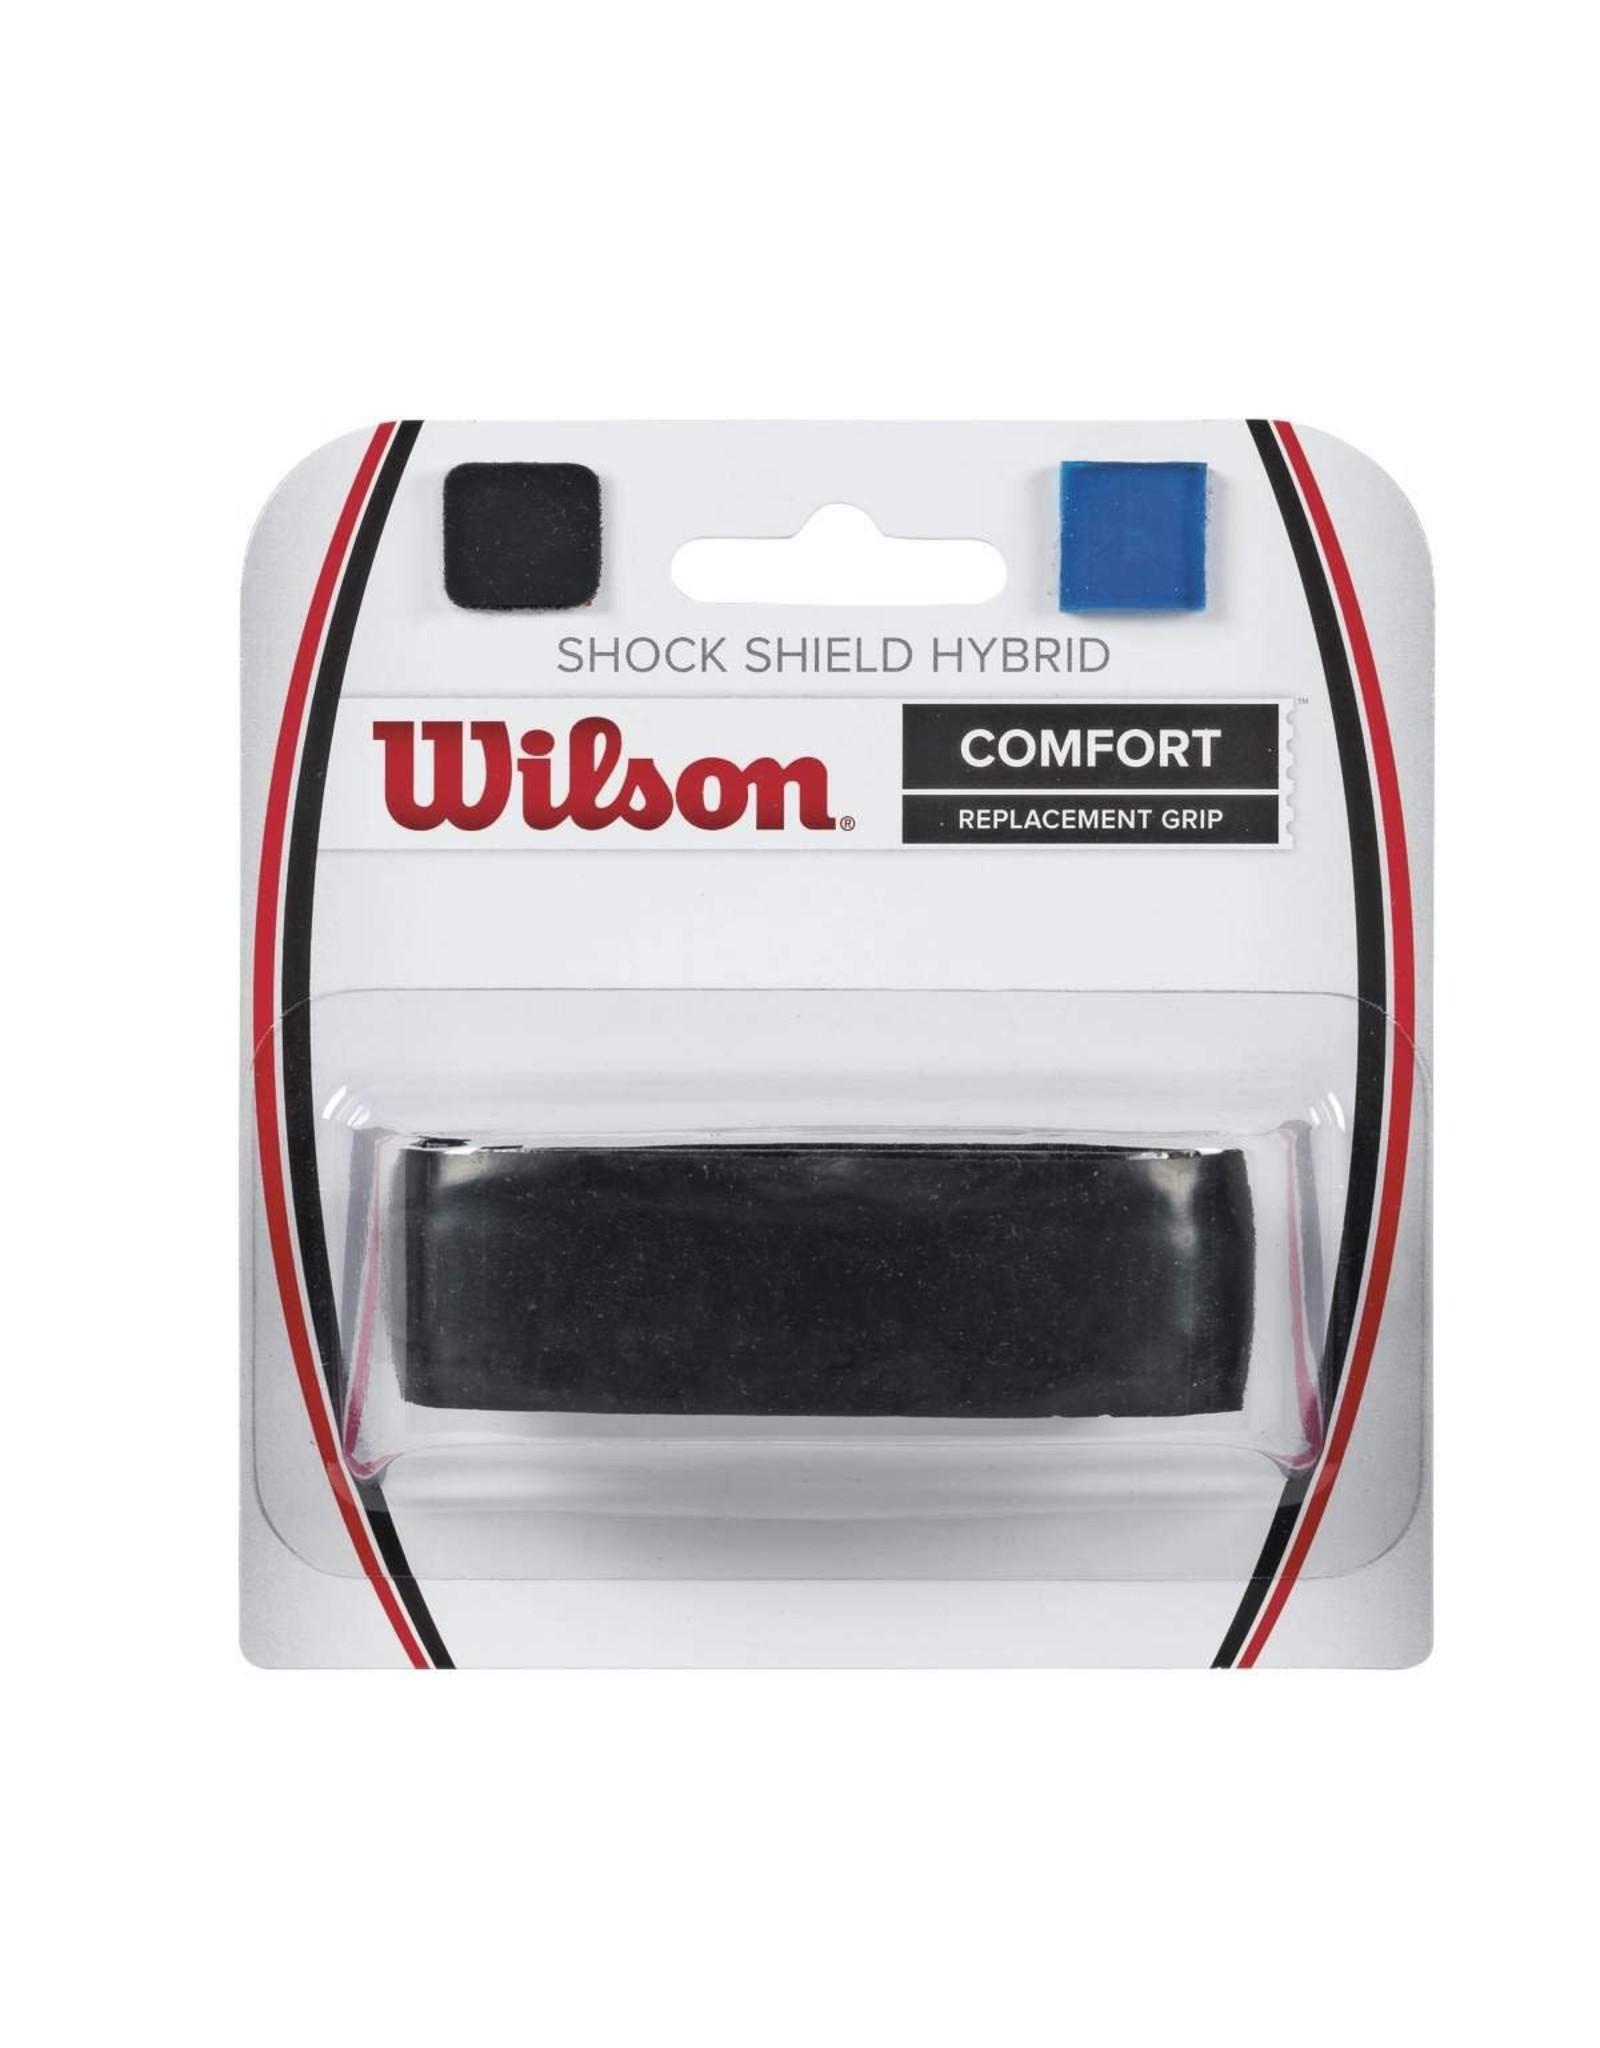 Wilson Shock Shield Hybrid